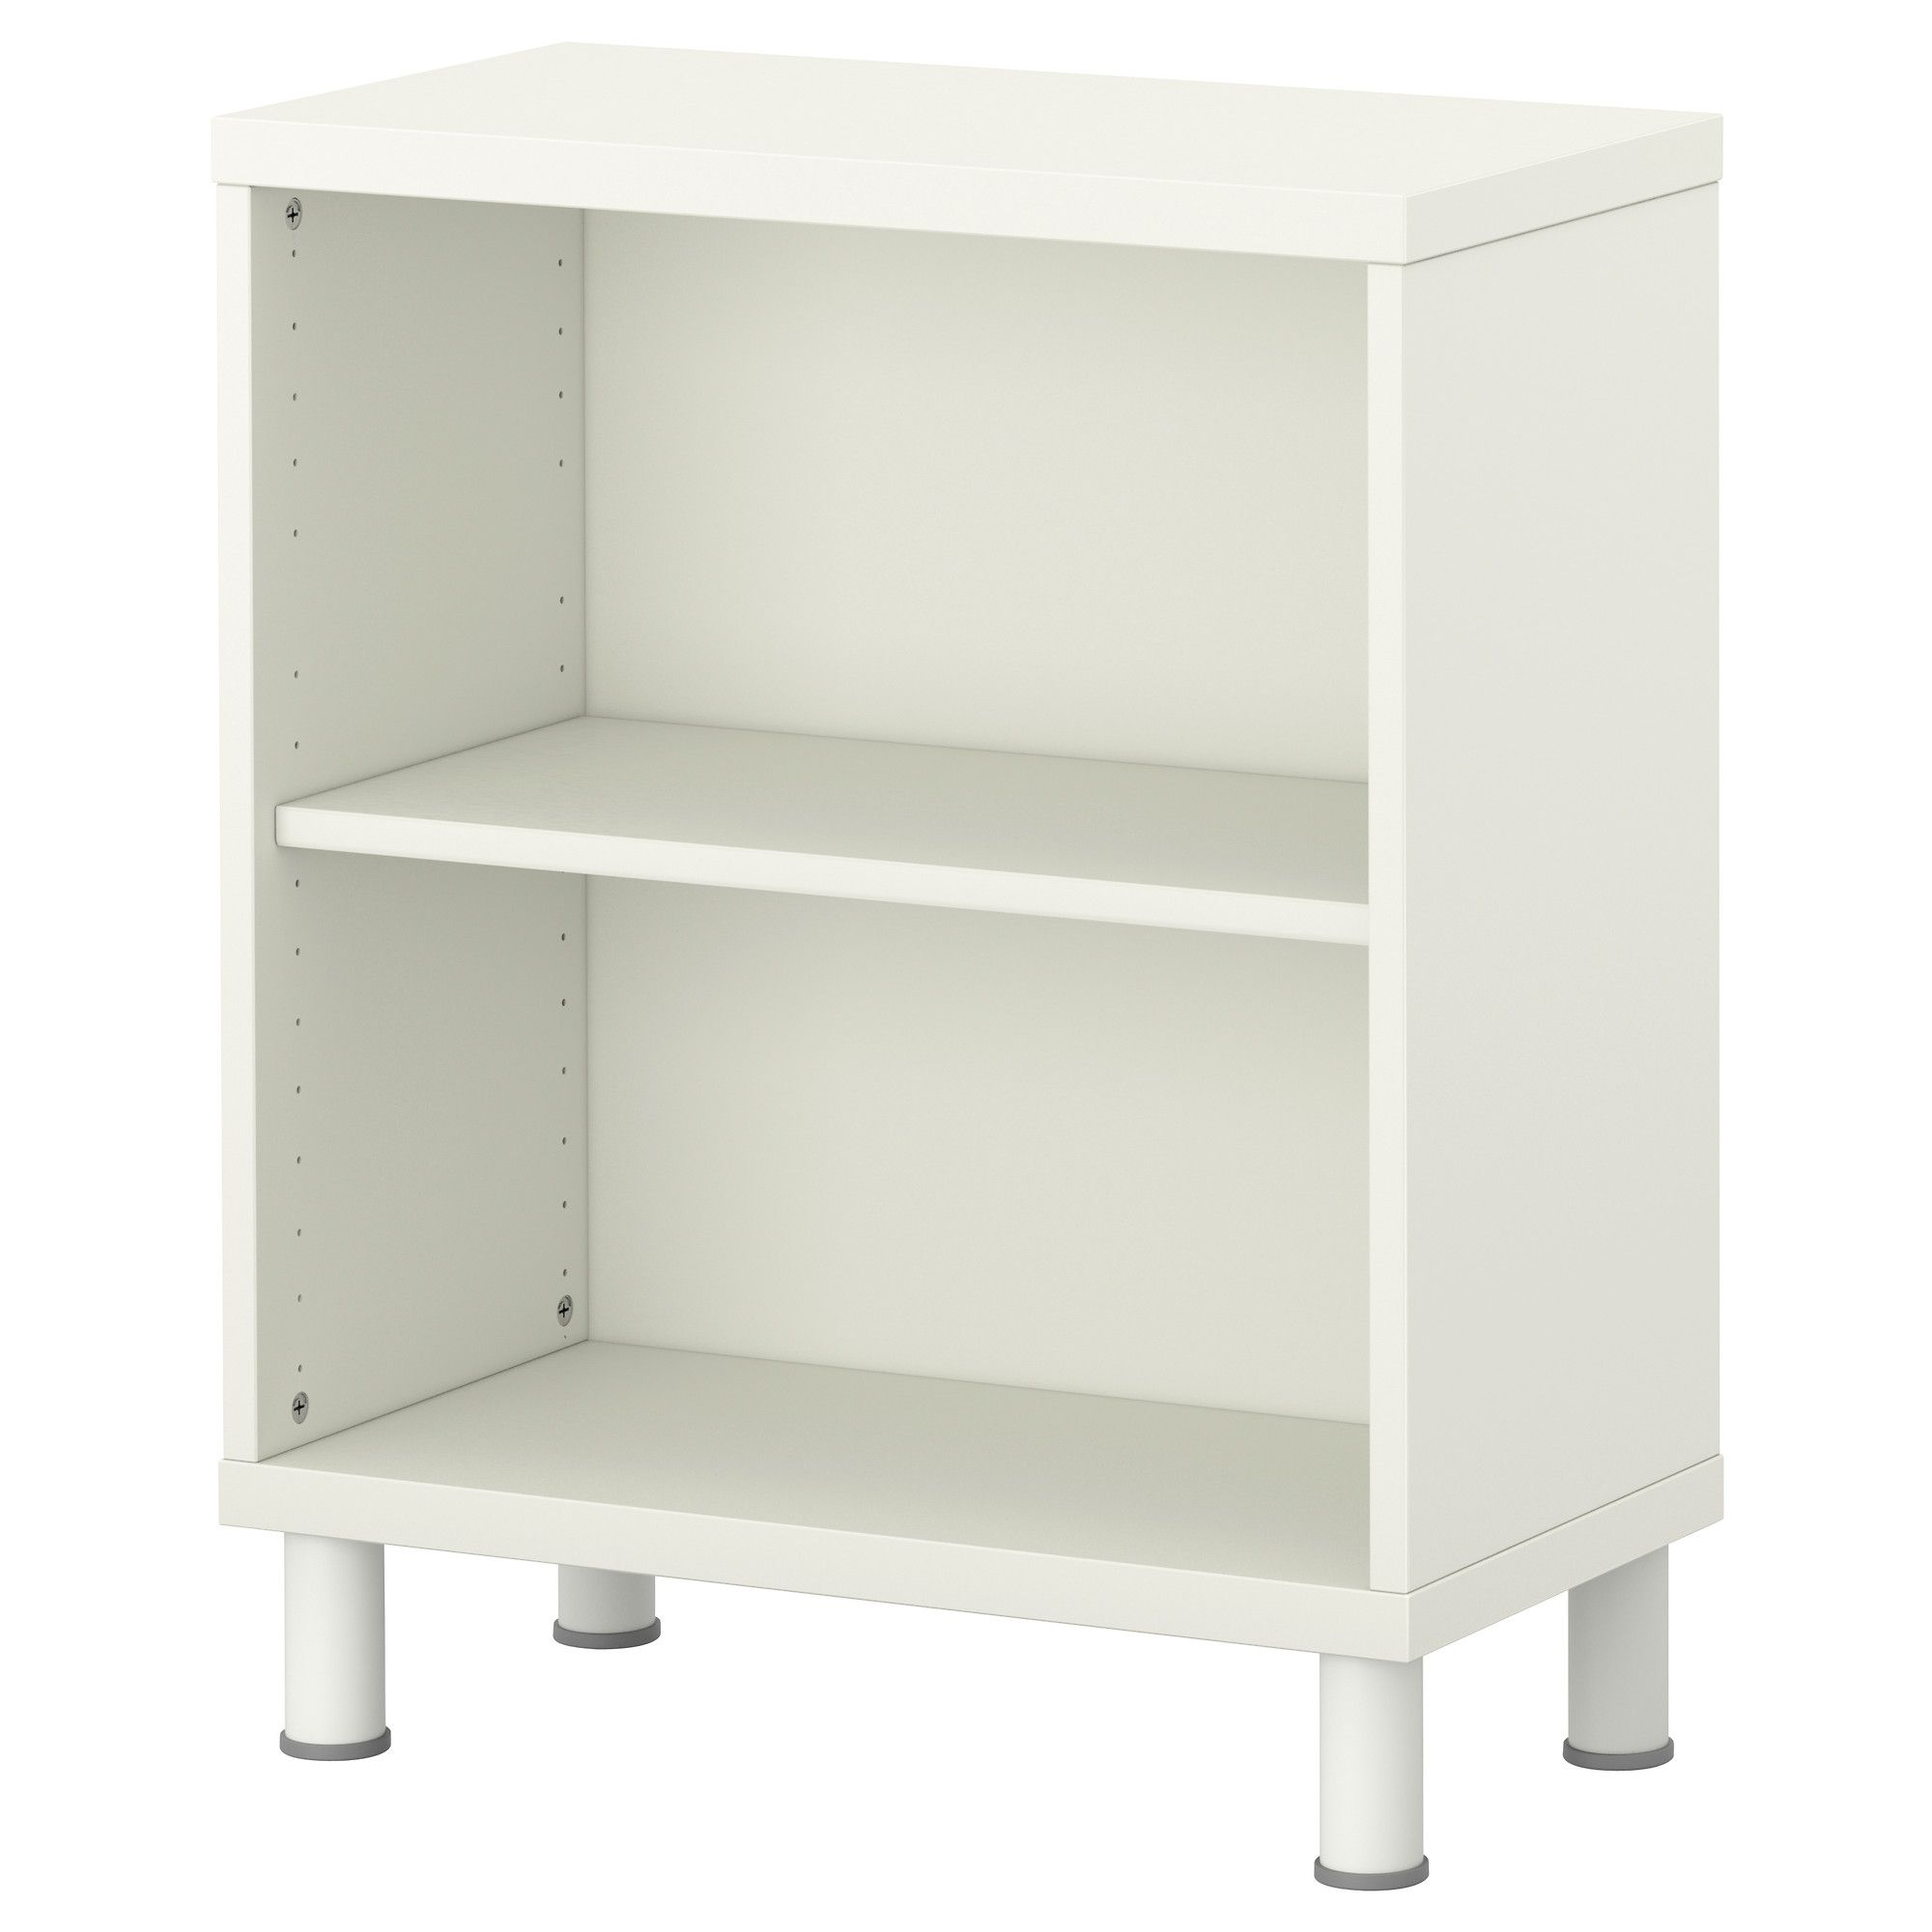 STUVA Storage bination with shelf IKEA $44 Simple open